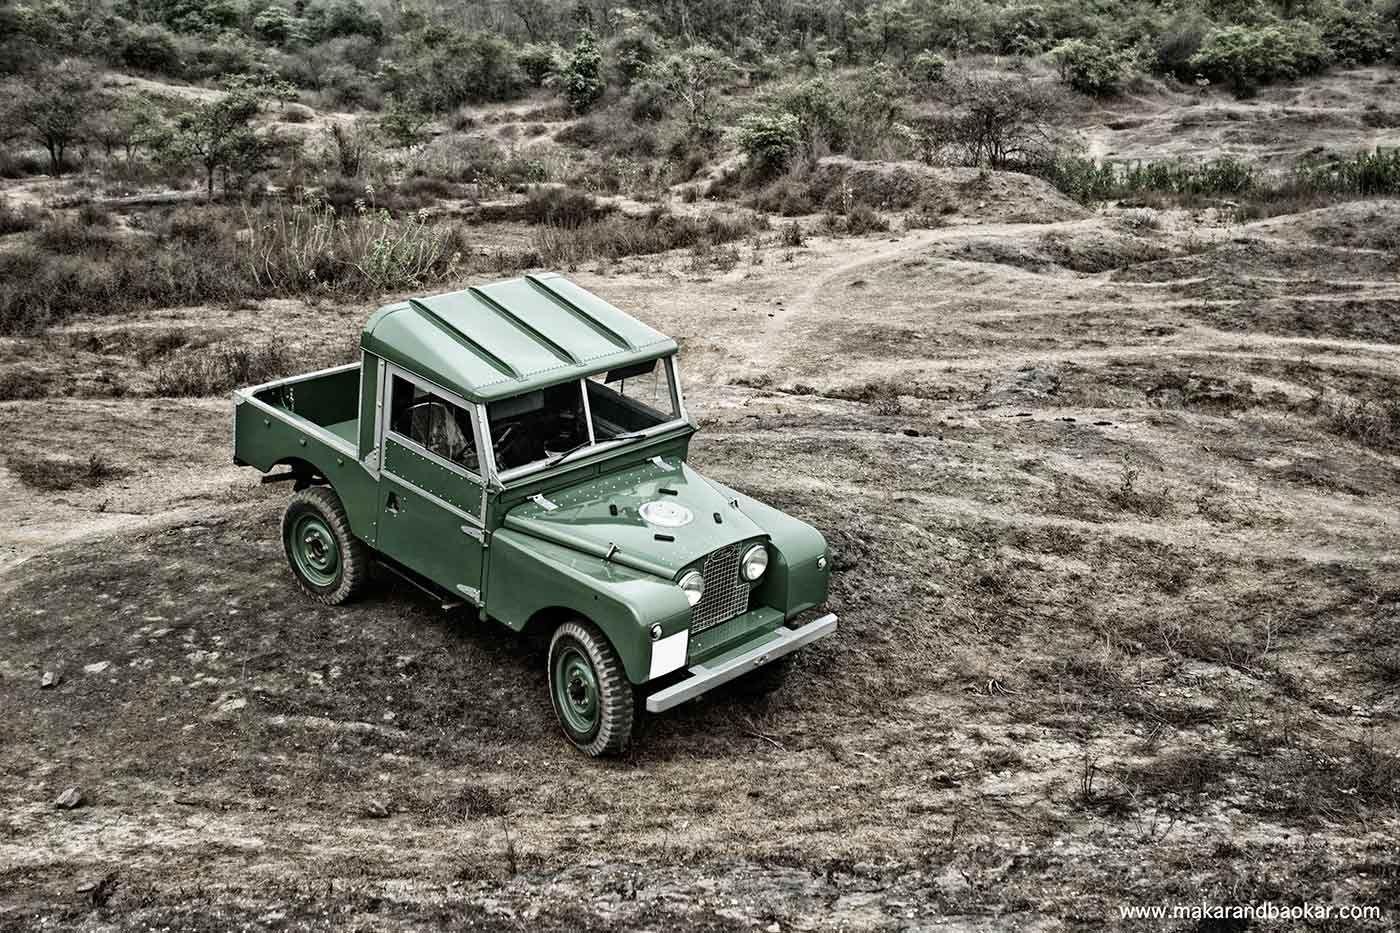 Born Free In A Land Rover Land Rover Car Wheels Land Rover Series